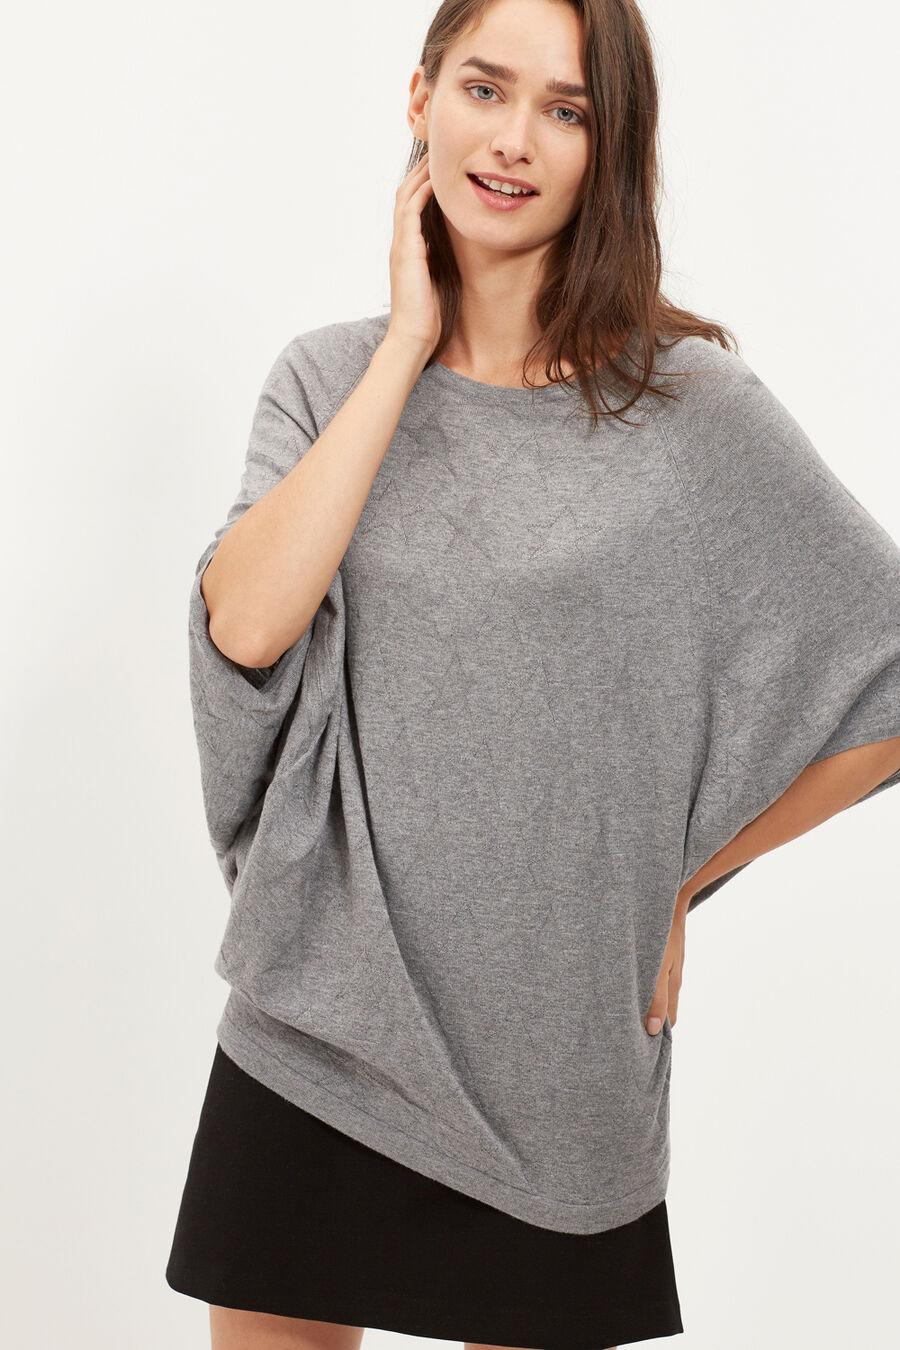 Stars print sweater